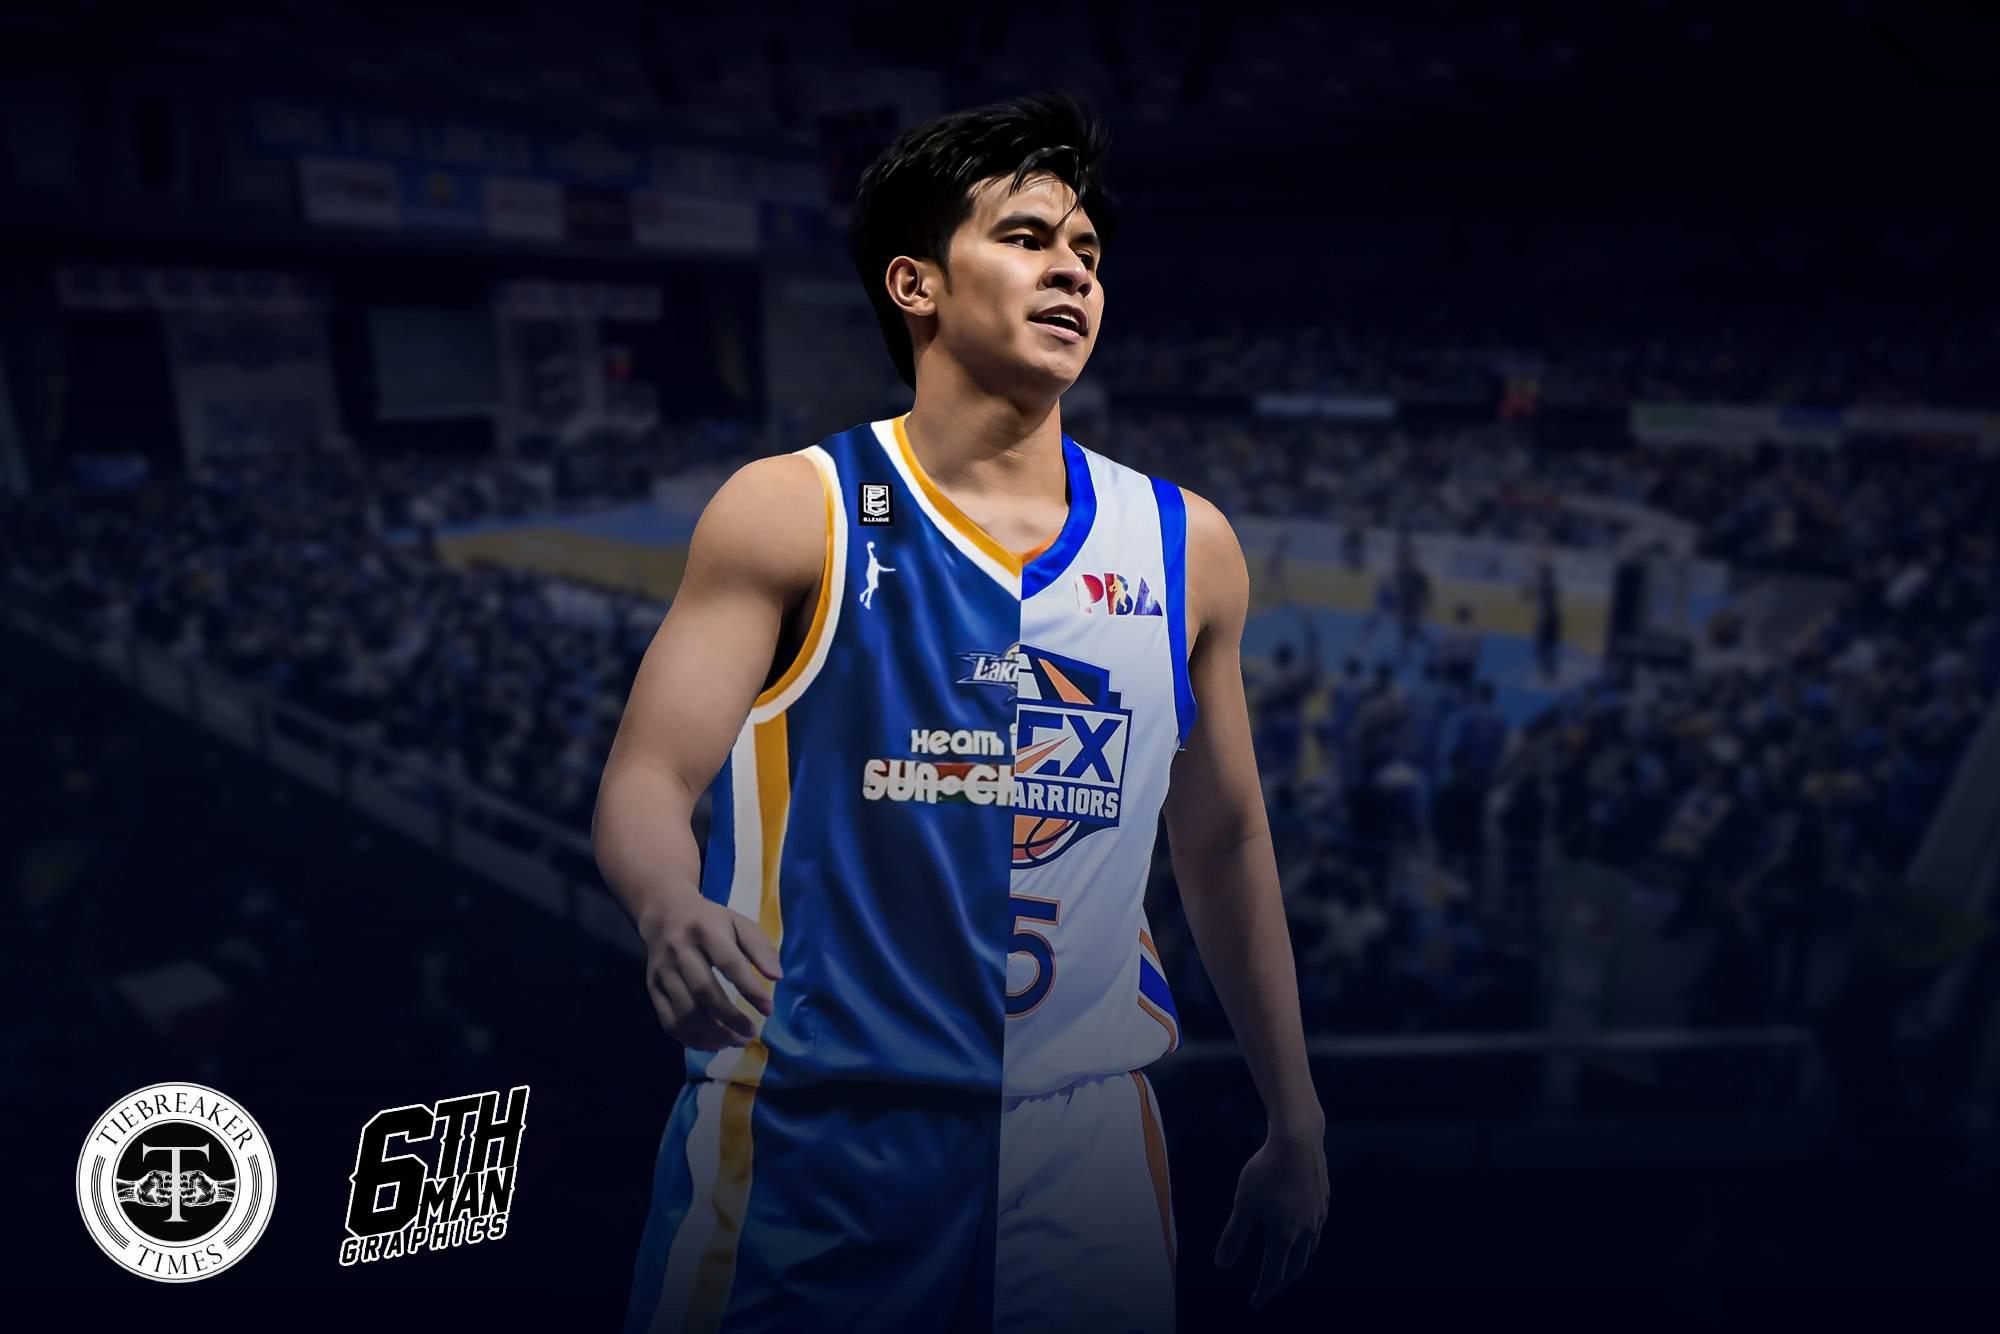 PBA-vs-BLeague-NLEX-vs-Shiga-Kiefer-Ravena-no-smart NLEX not thinking about bringing Kiefer back yet: 'Mag-focus muna kami sa laro namin' Basketball News PBA  - philippine sports news